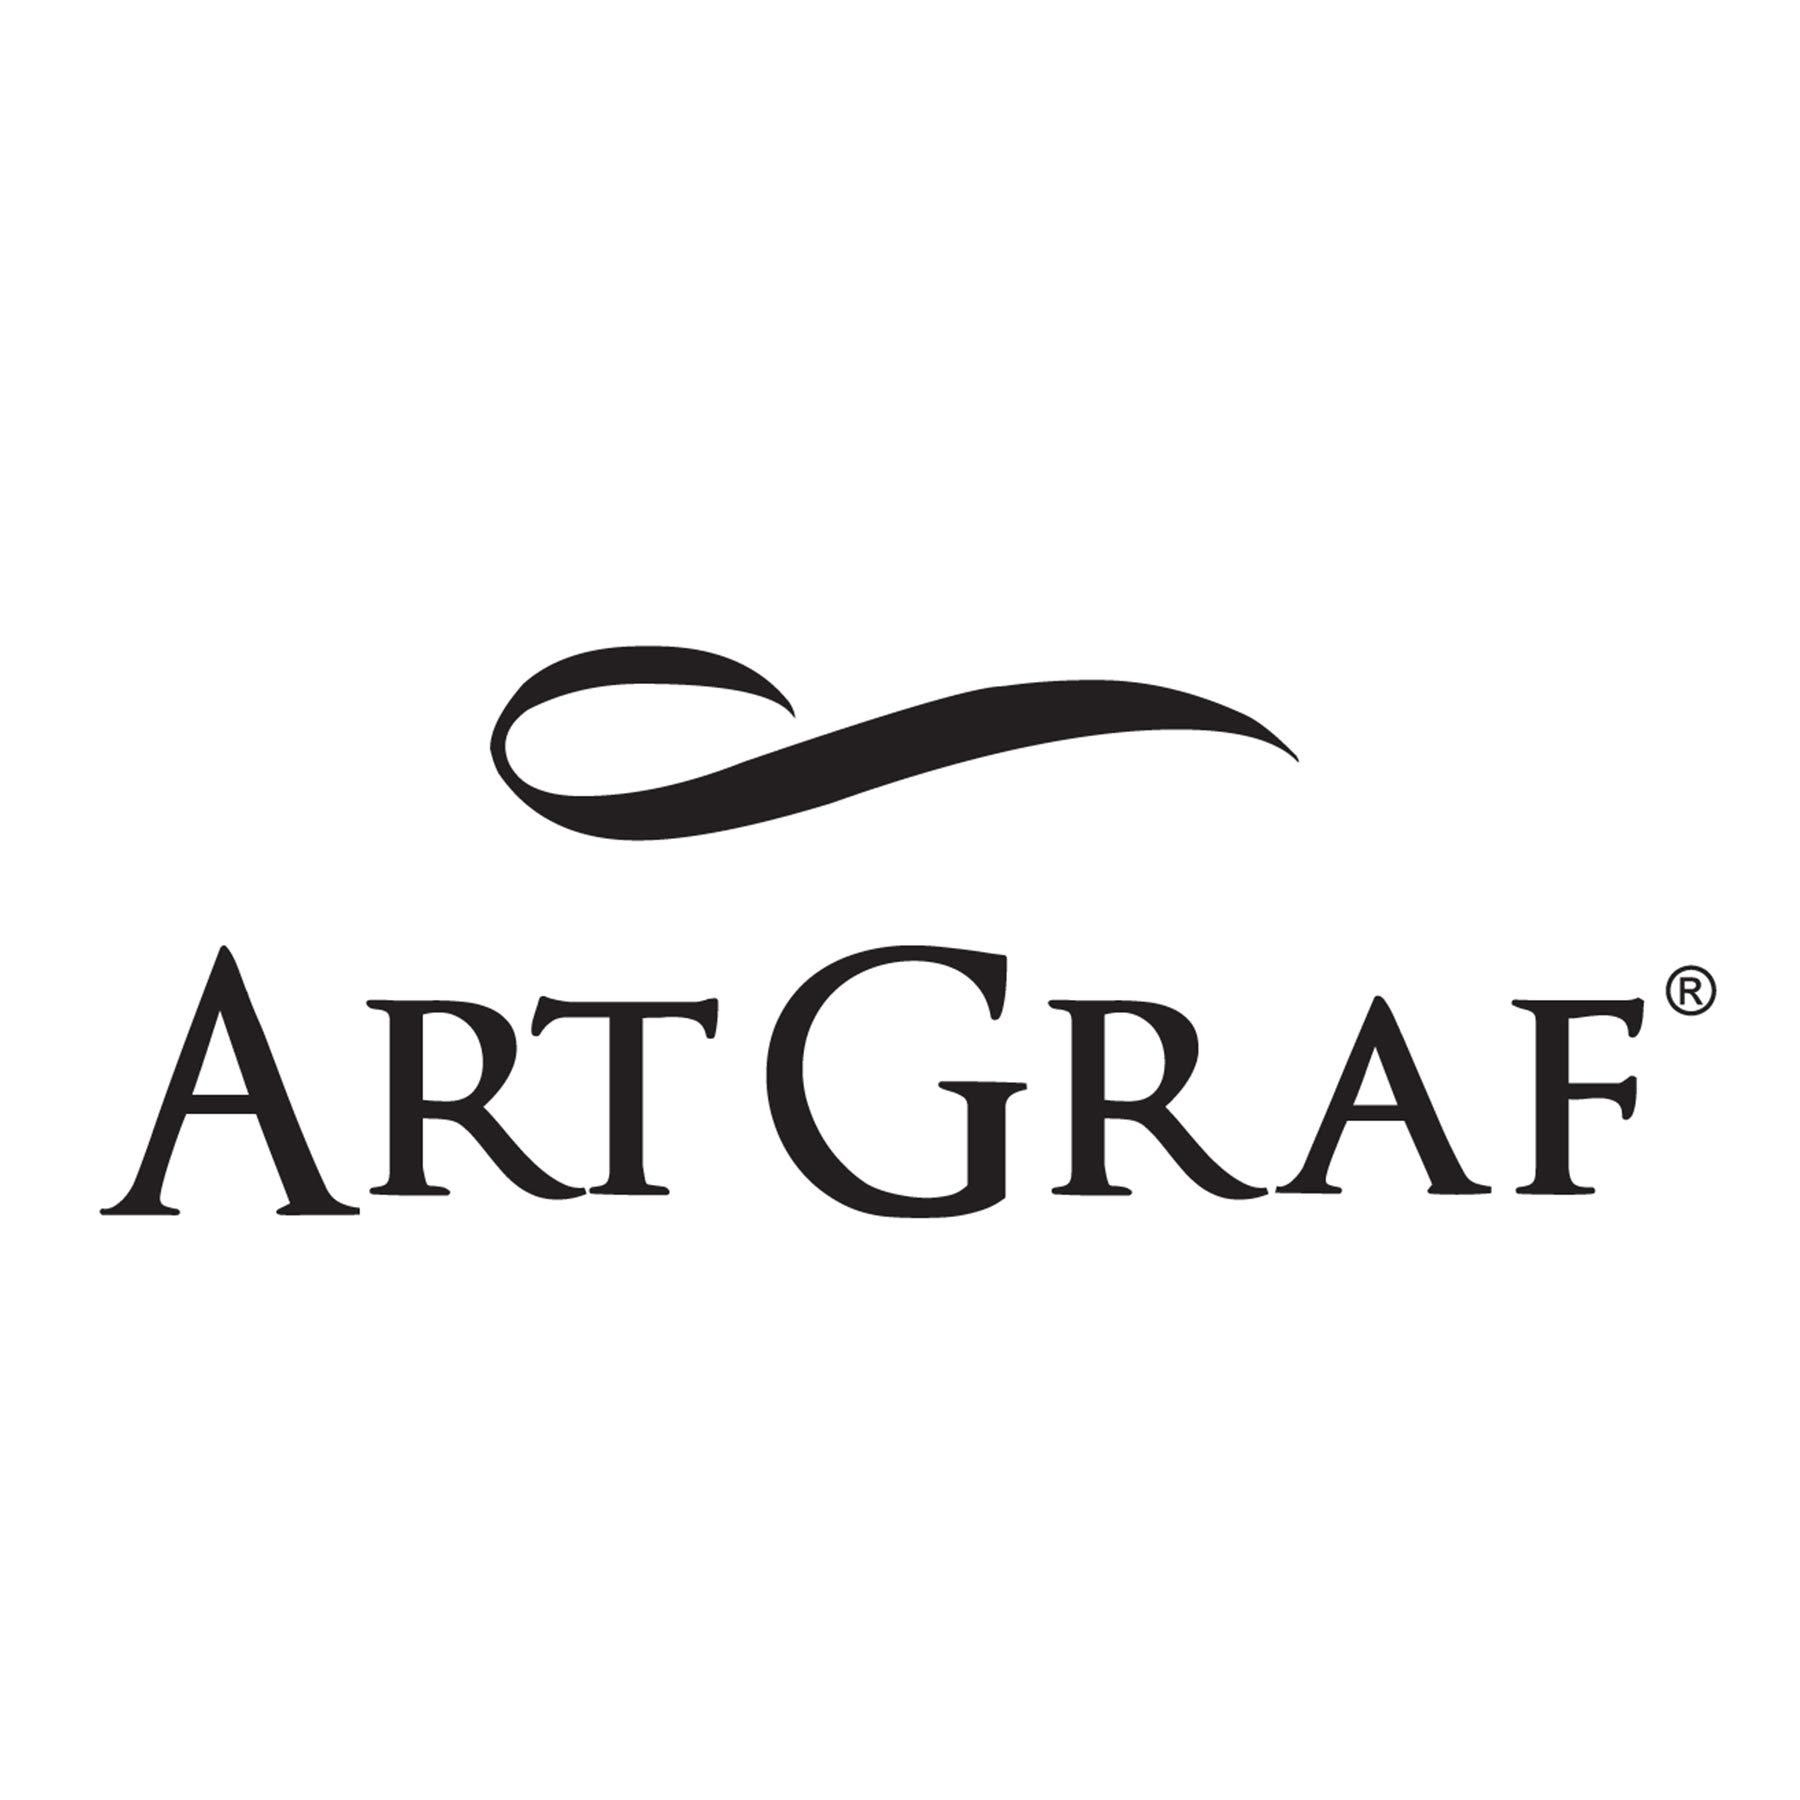 Art Graf